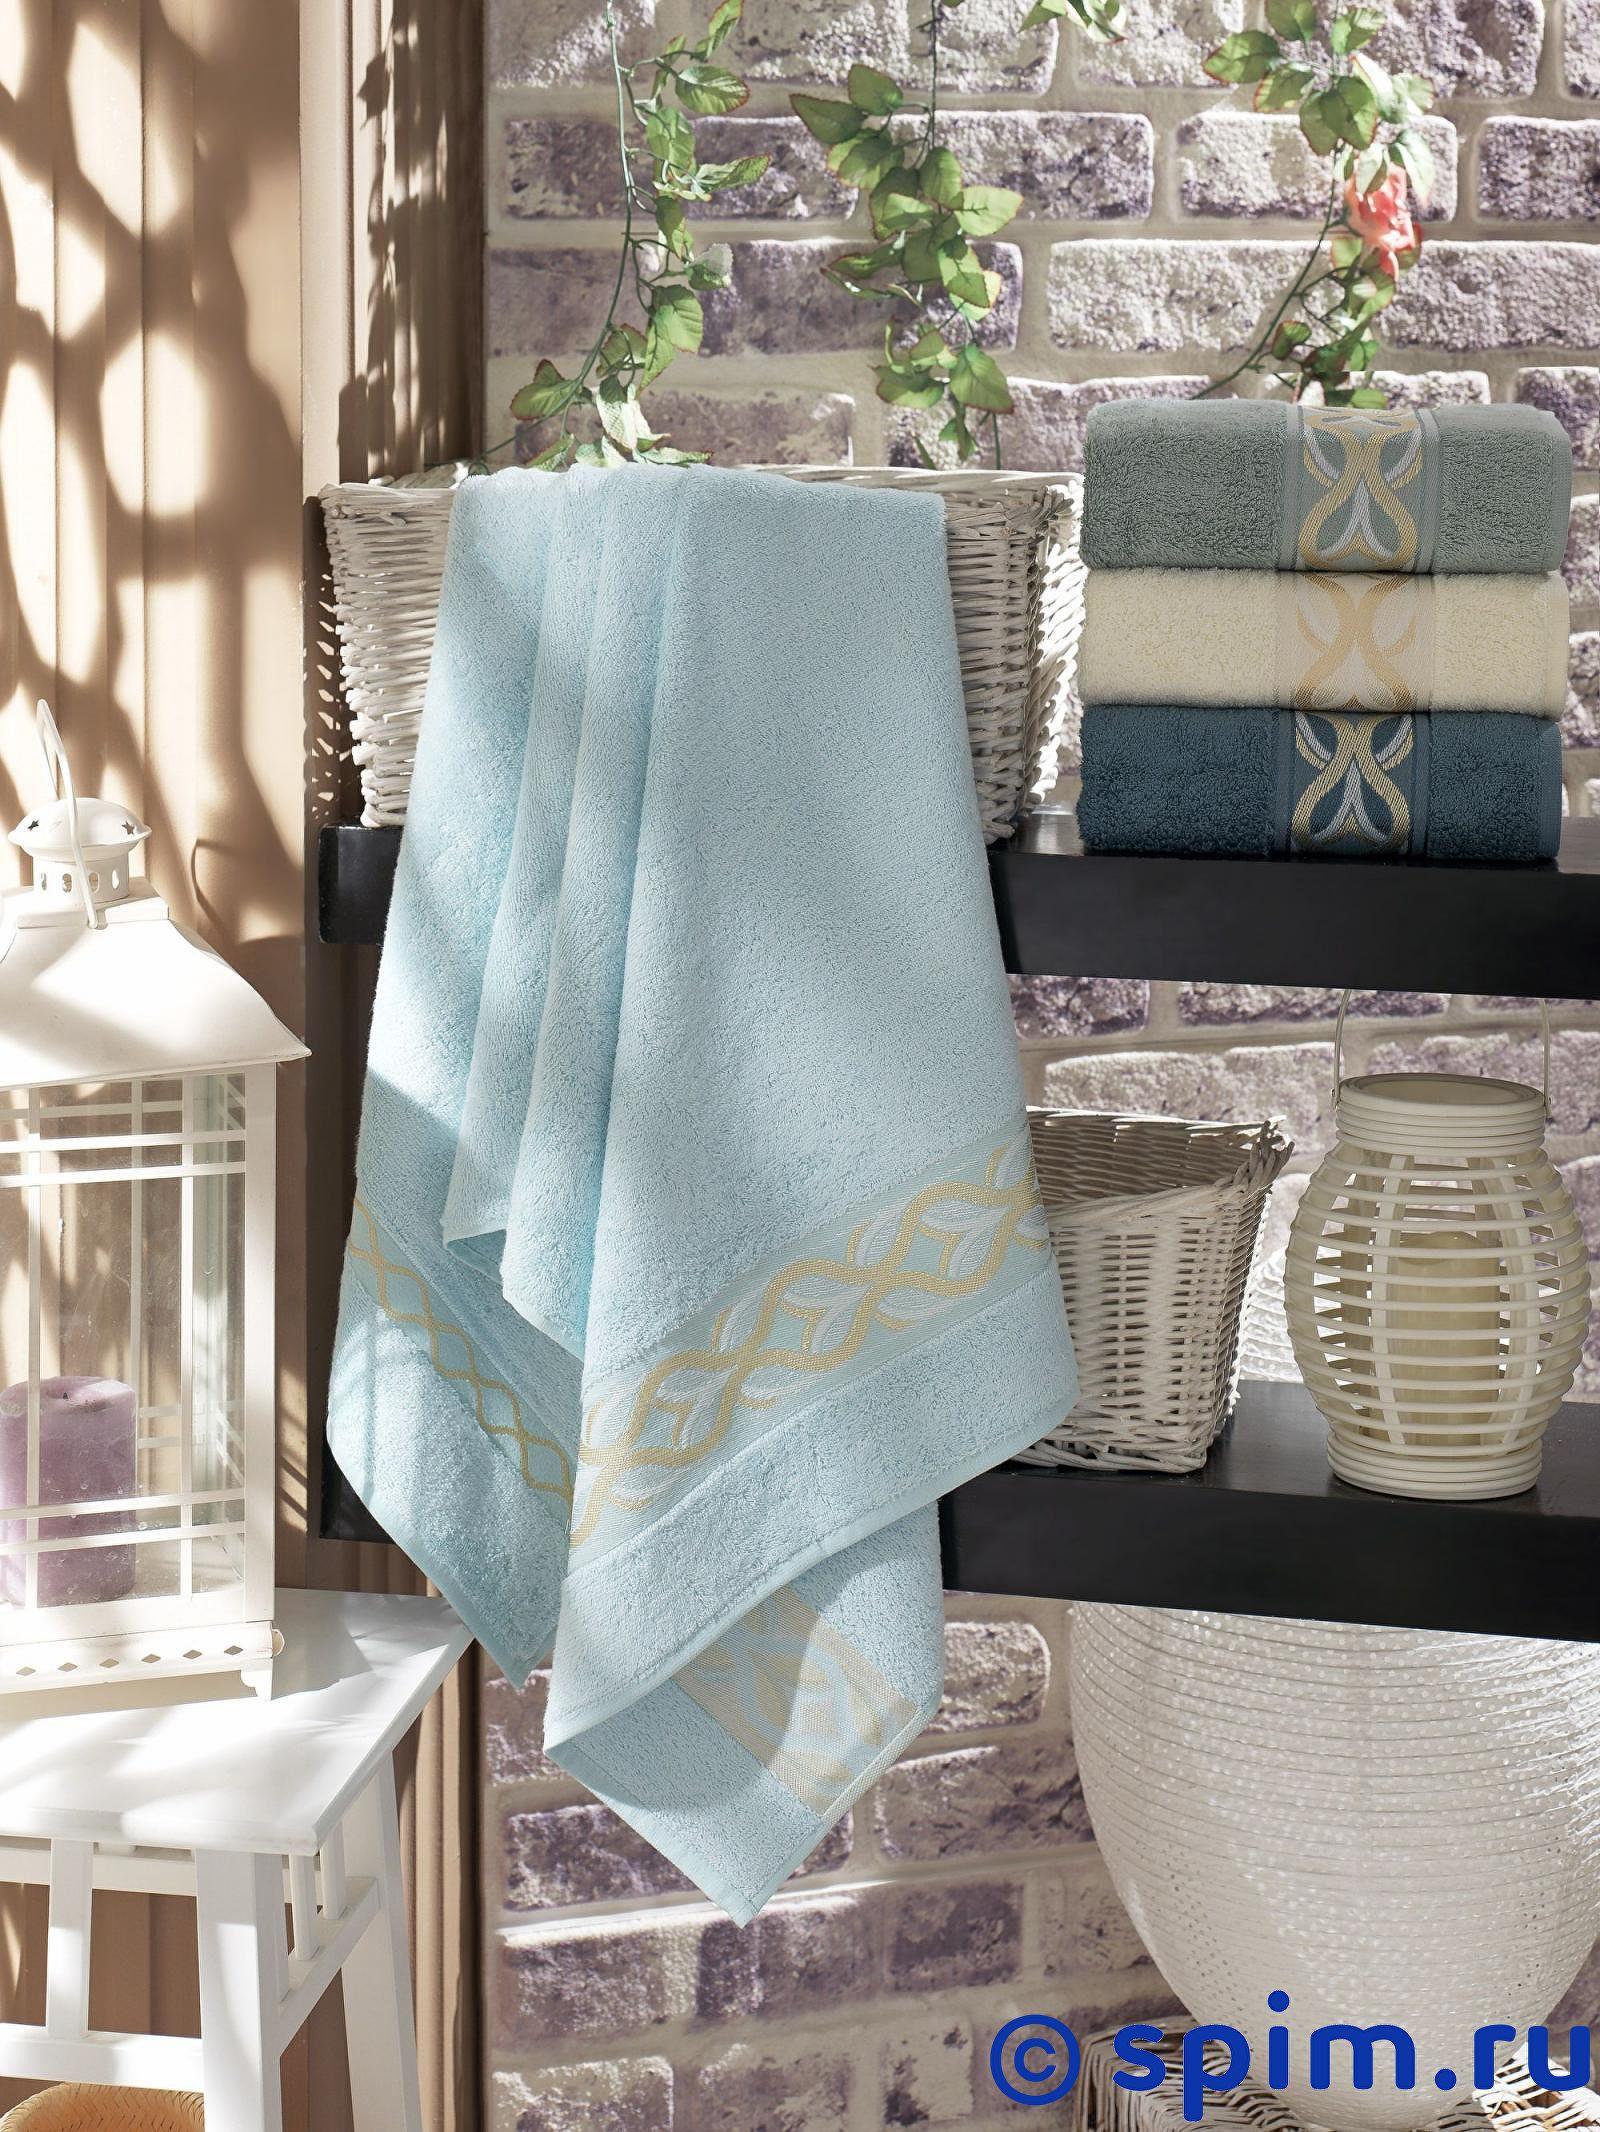 Набор из 4-х полотенец Do&co Lilium 50х90 см полотенца do n co полотенце lady цвет мятный набор